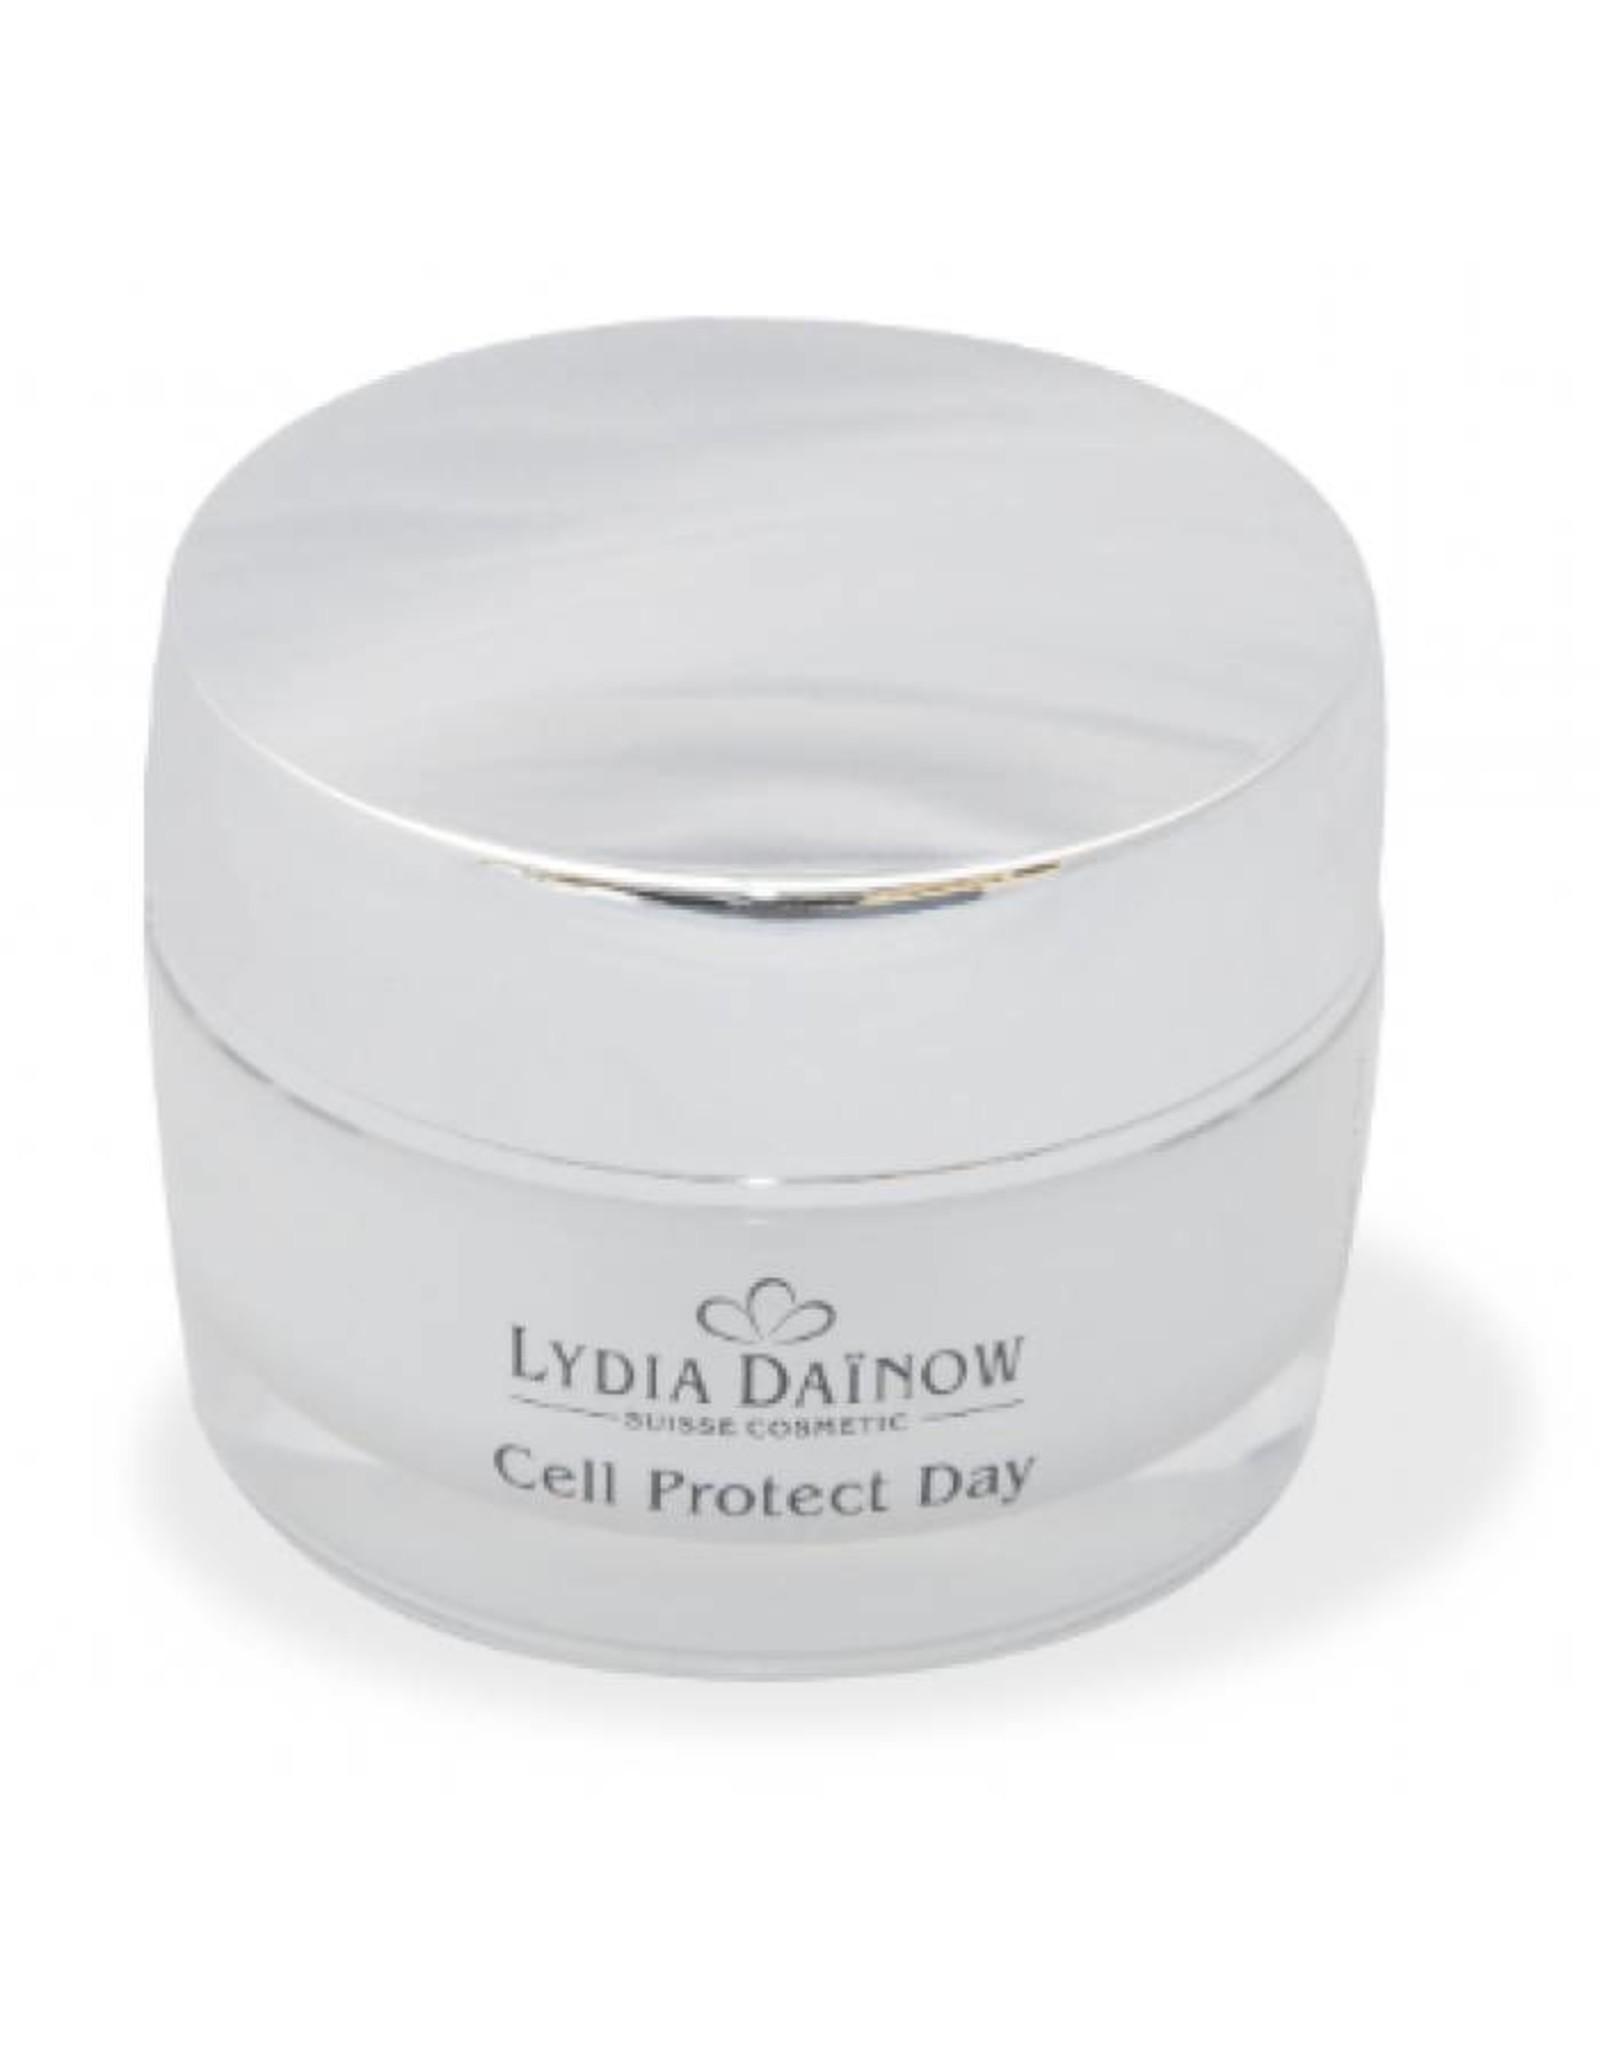 Lydïa Dainow Cell Protect Day - Crème de jour